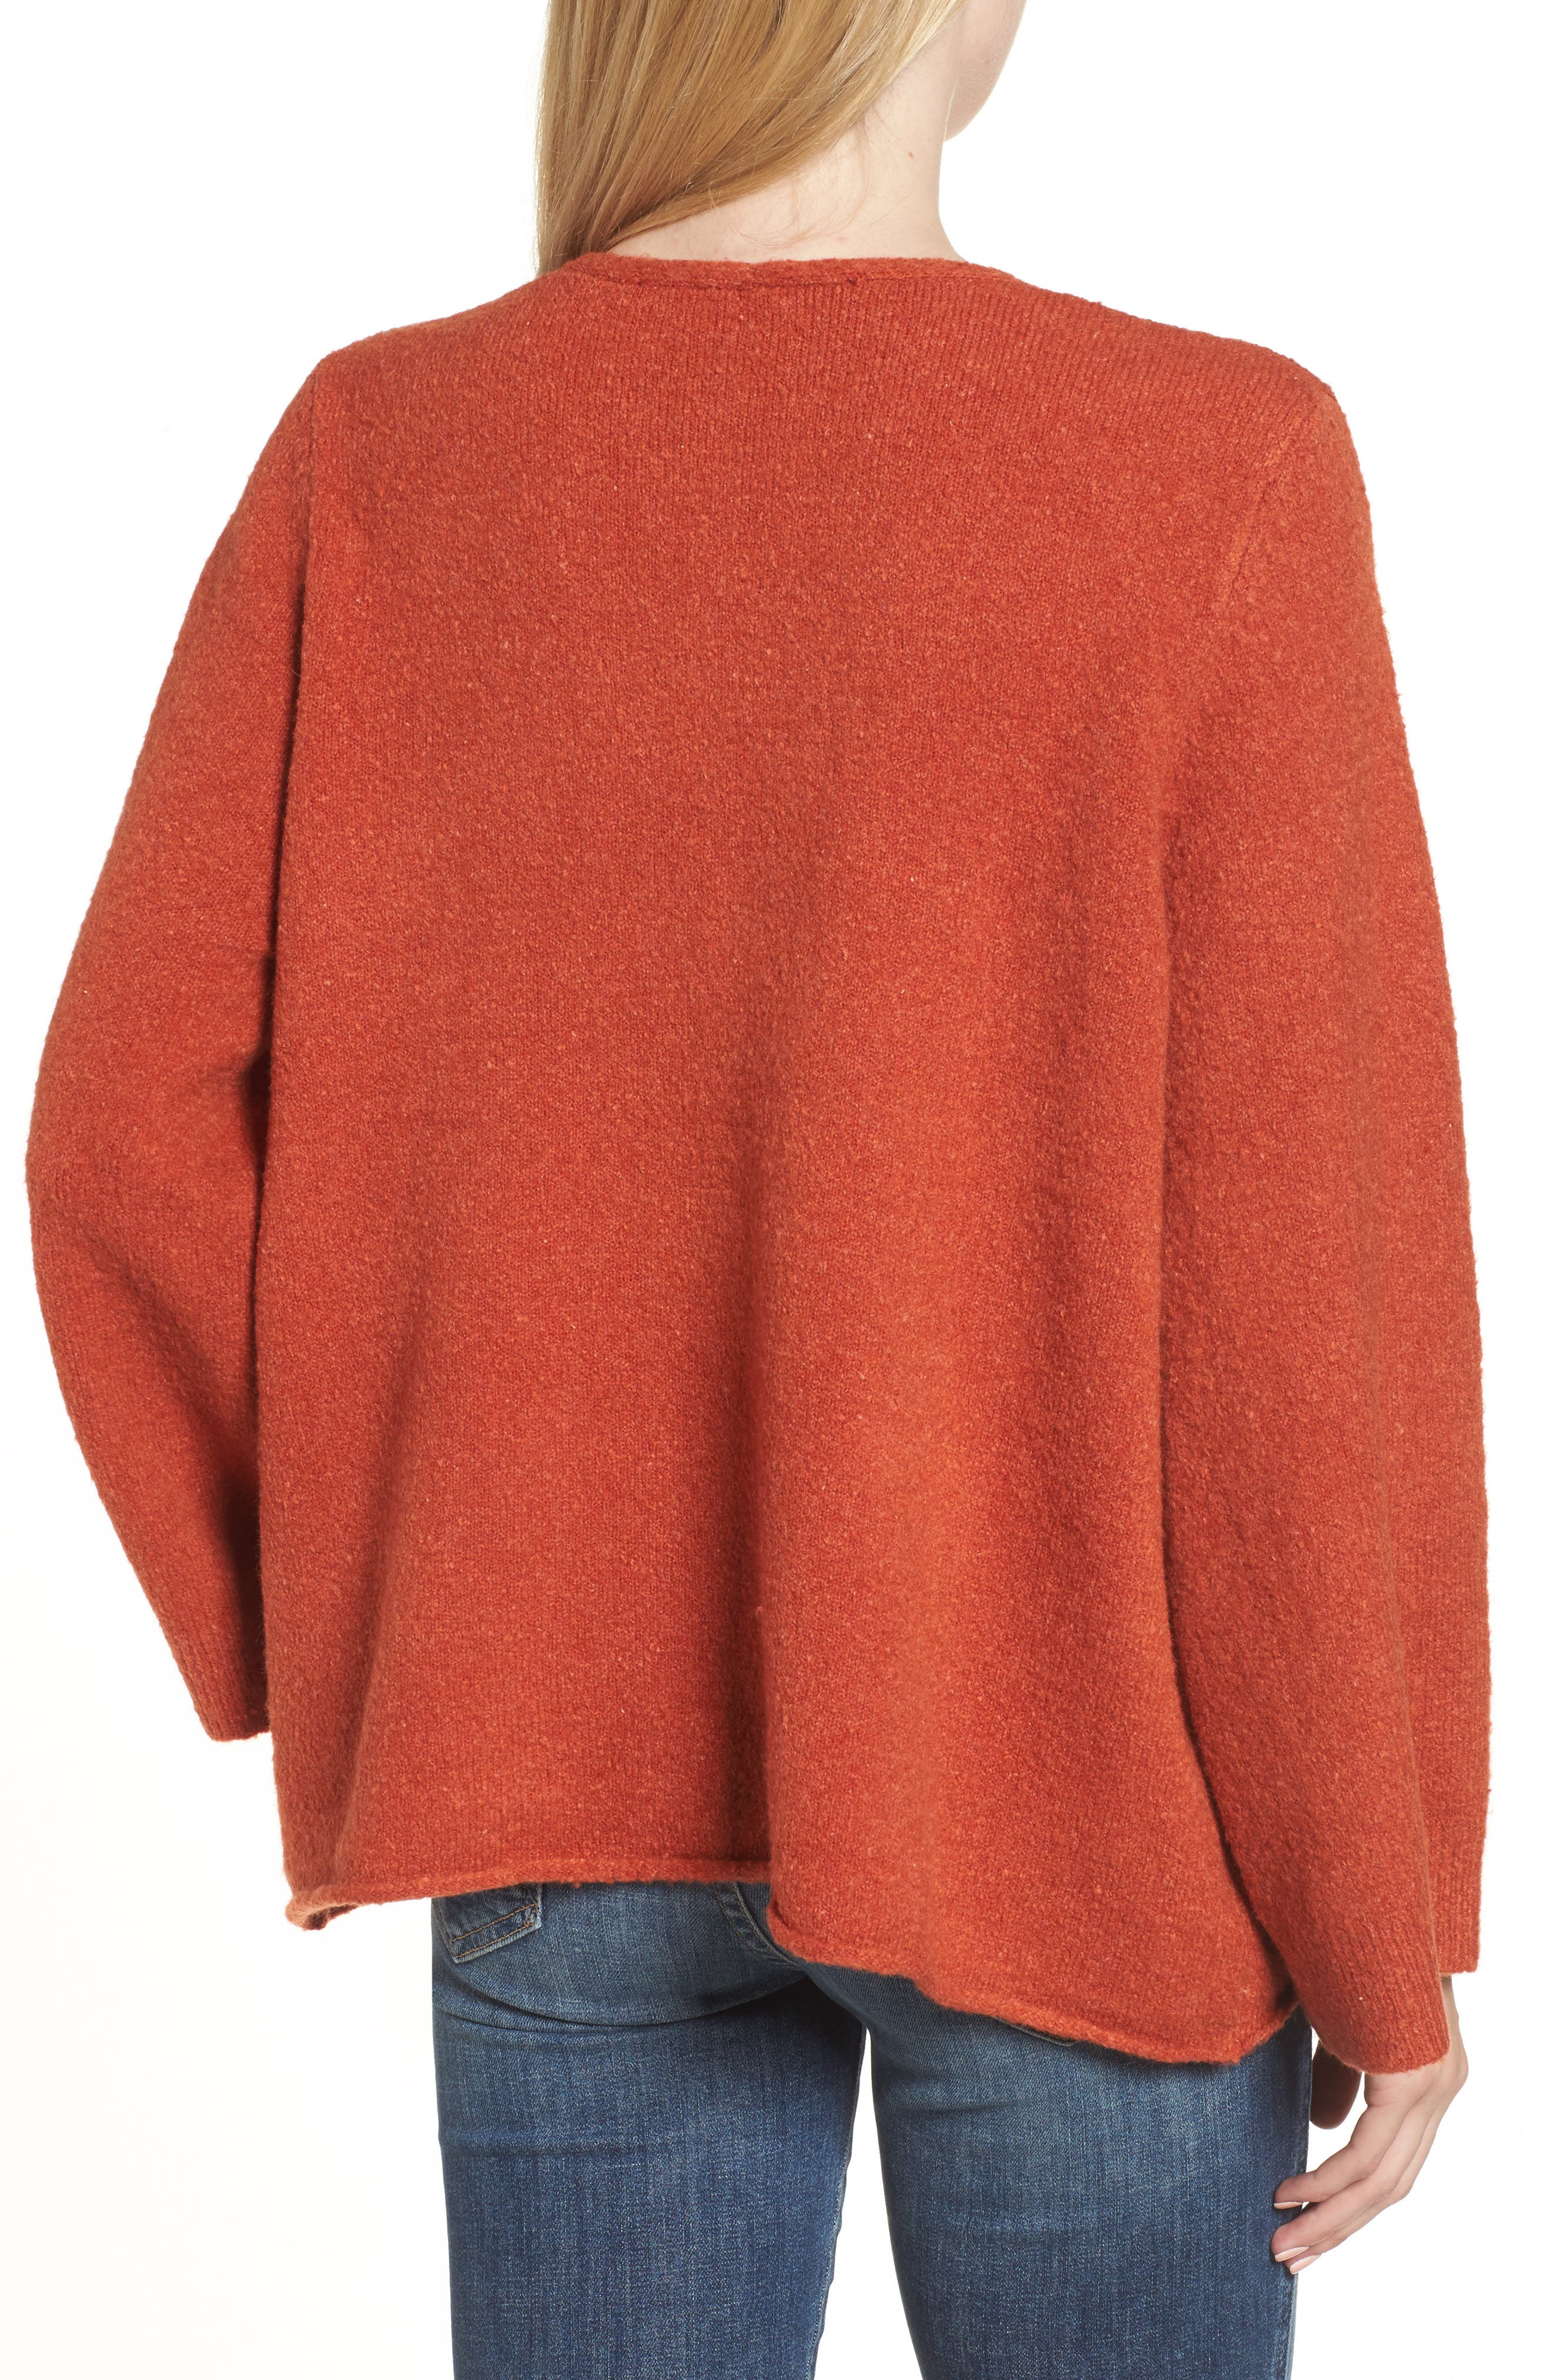 Urban Flossy Sweater,                             Alternate thumbnail 8, color,